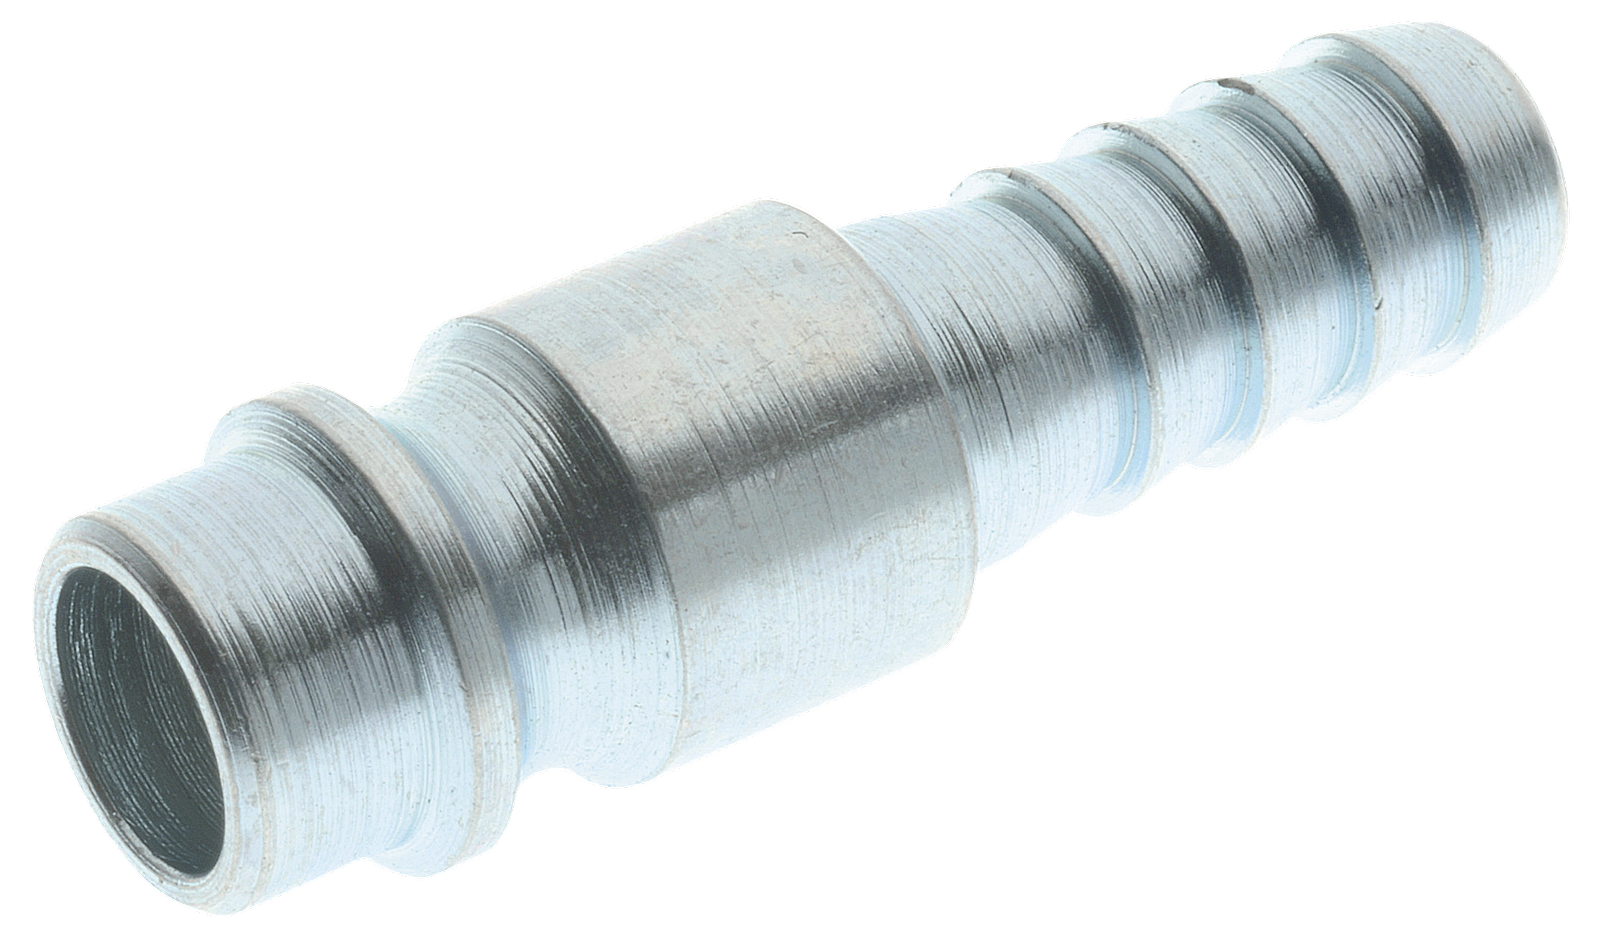 Vsuvka do rychlospojky pro hadici ocelová 6 mm -